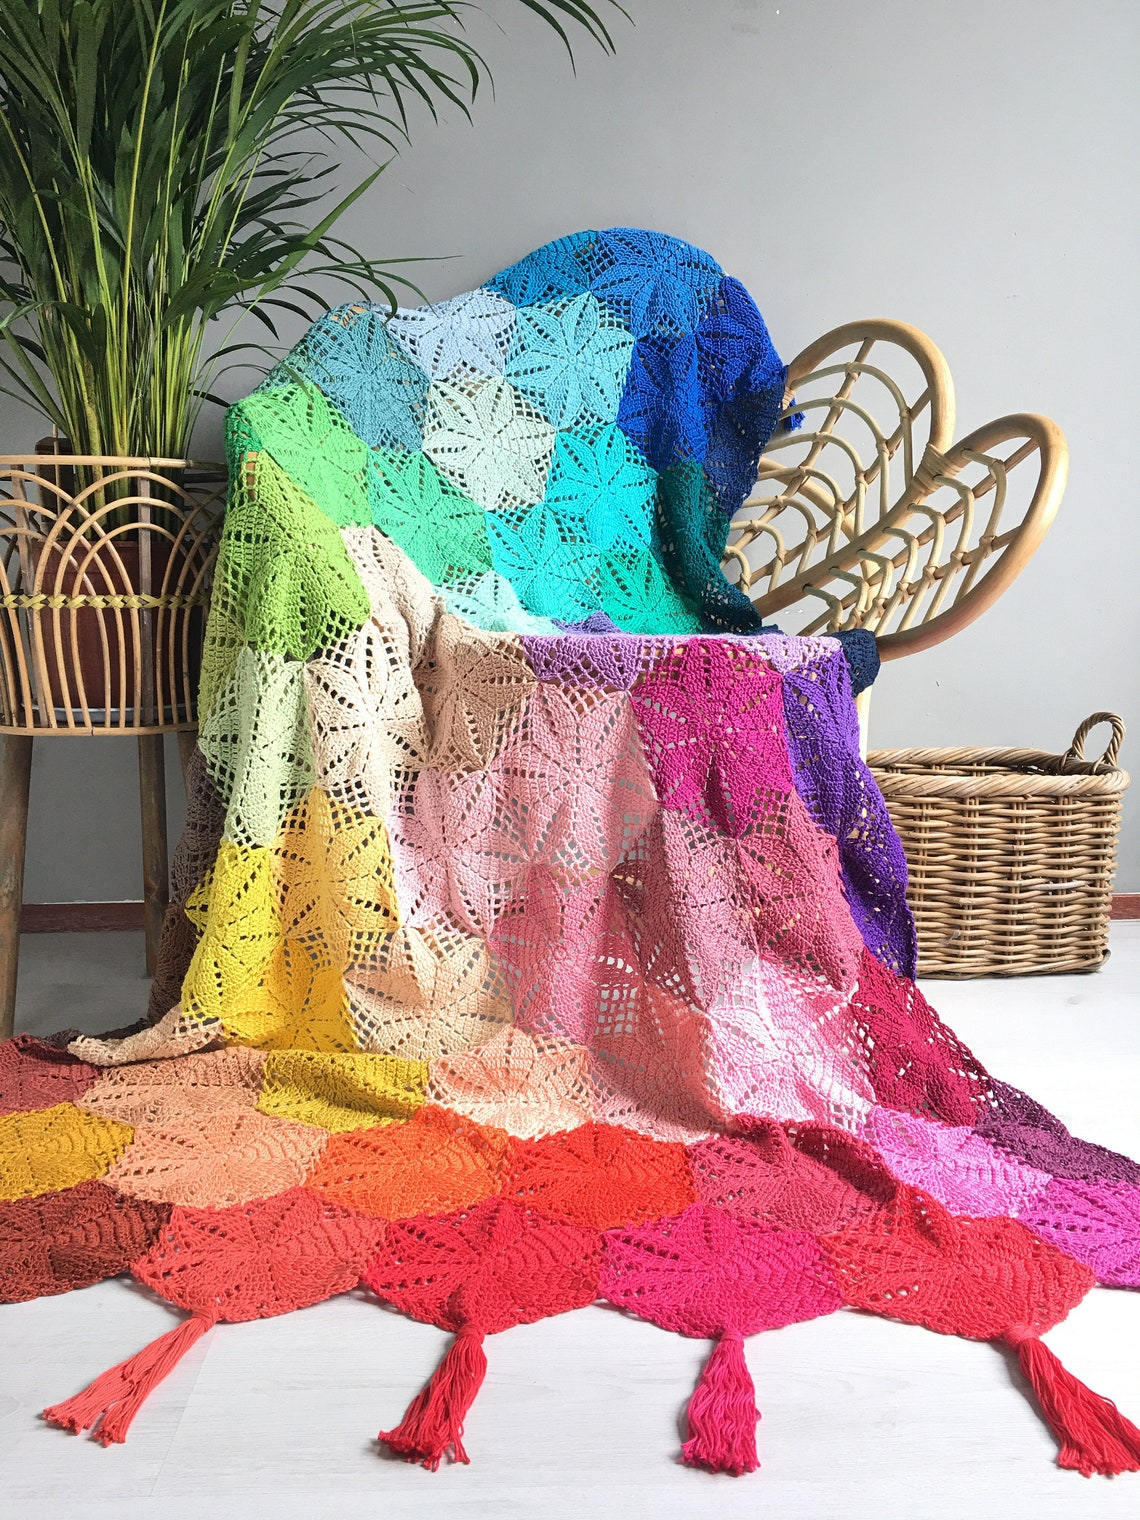 Live In Bright Technicolor With Atty's Anemone Blanket - Crocheter's Dream Project!